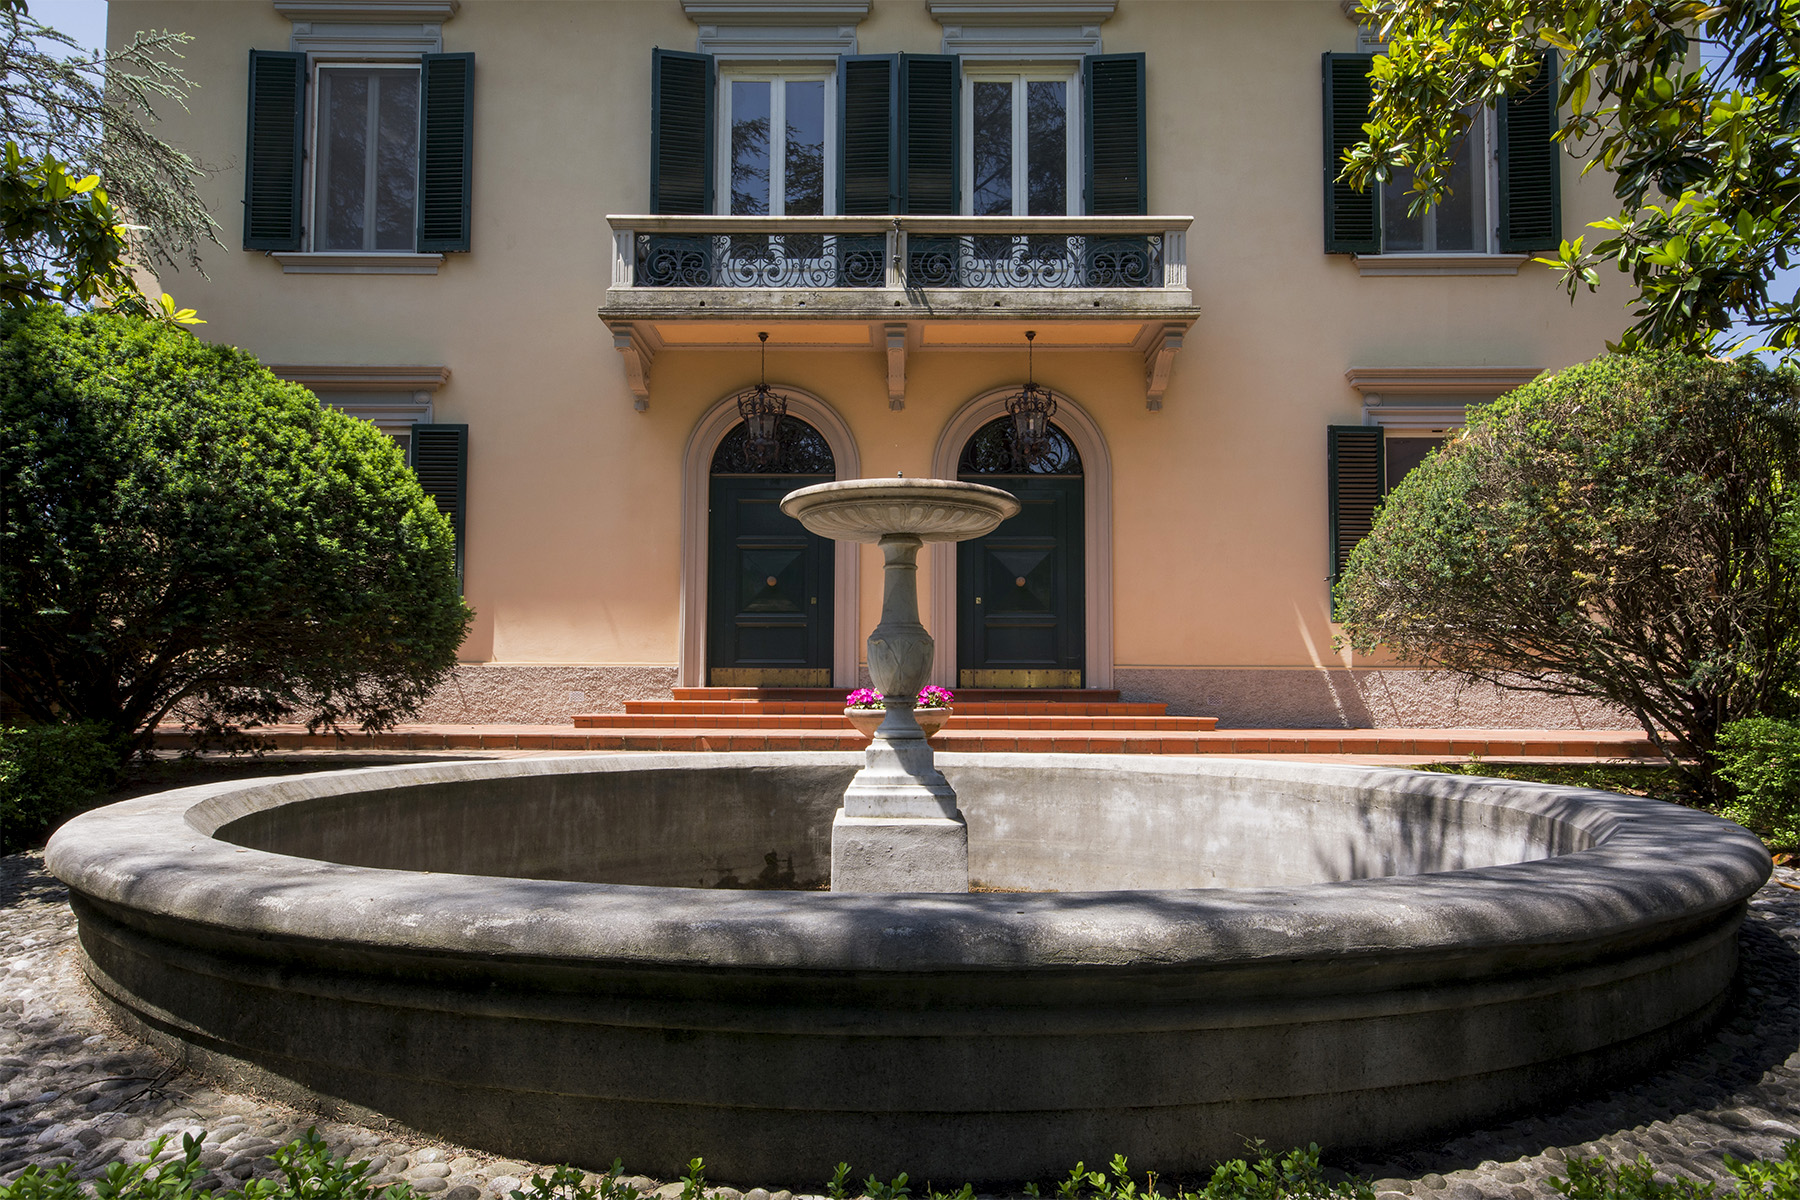 Villa in Vendita a Lucca: 5 locali, 760 mq - Foto 4